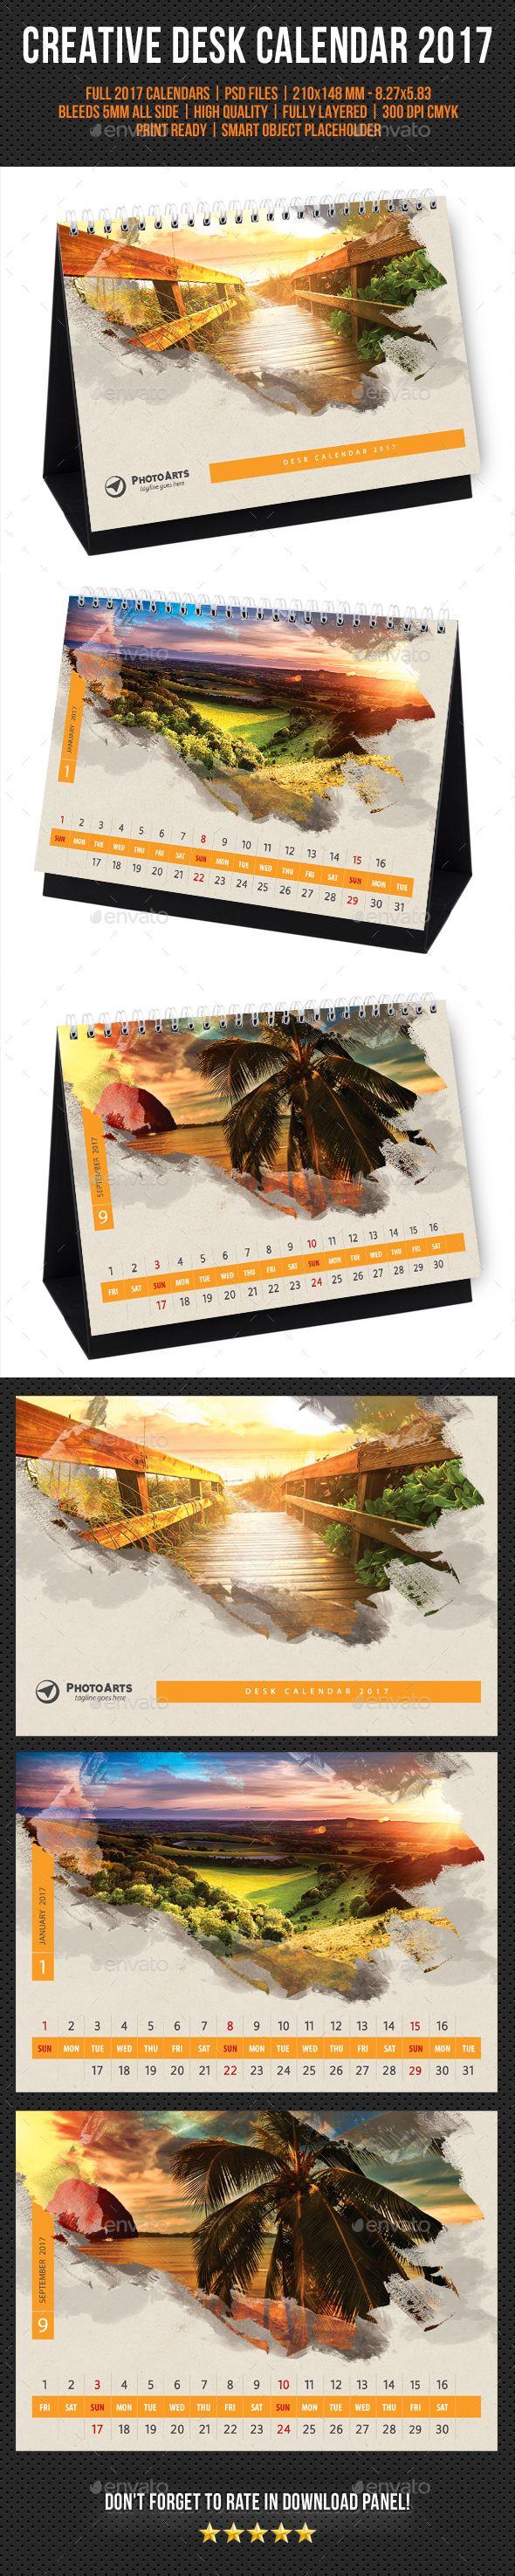 Creative Desk Calendar 2017 Template Psd Calendar Templates